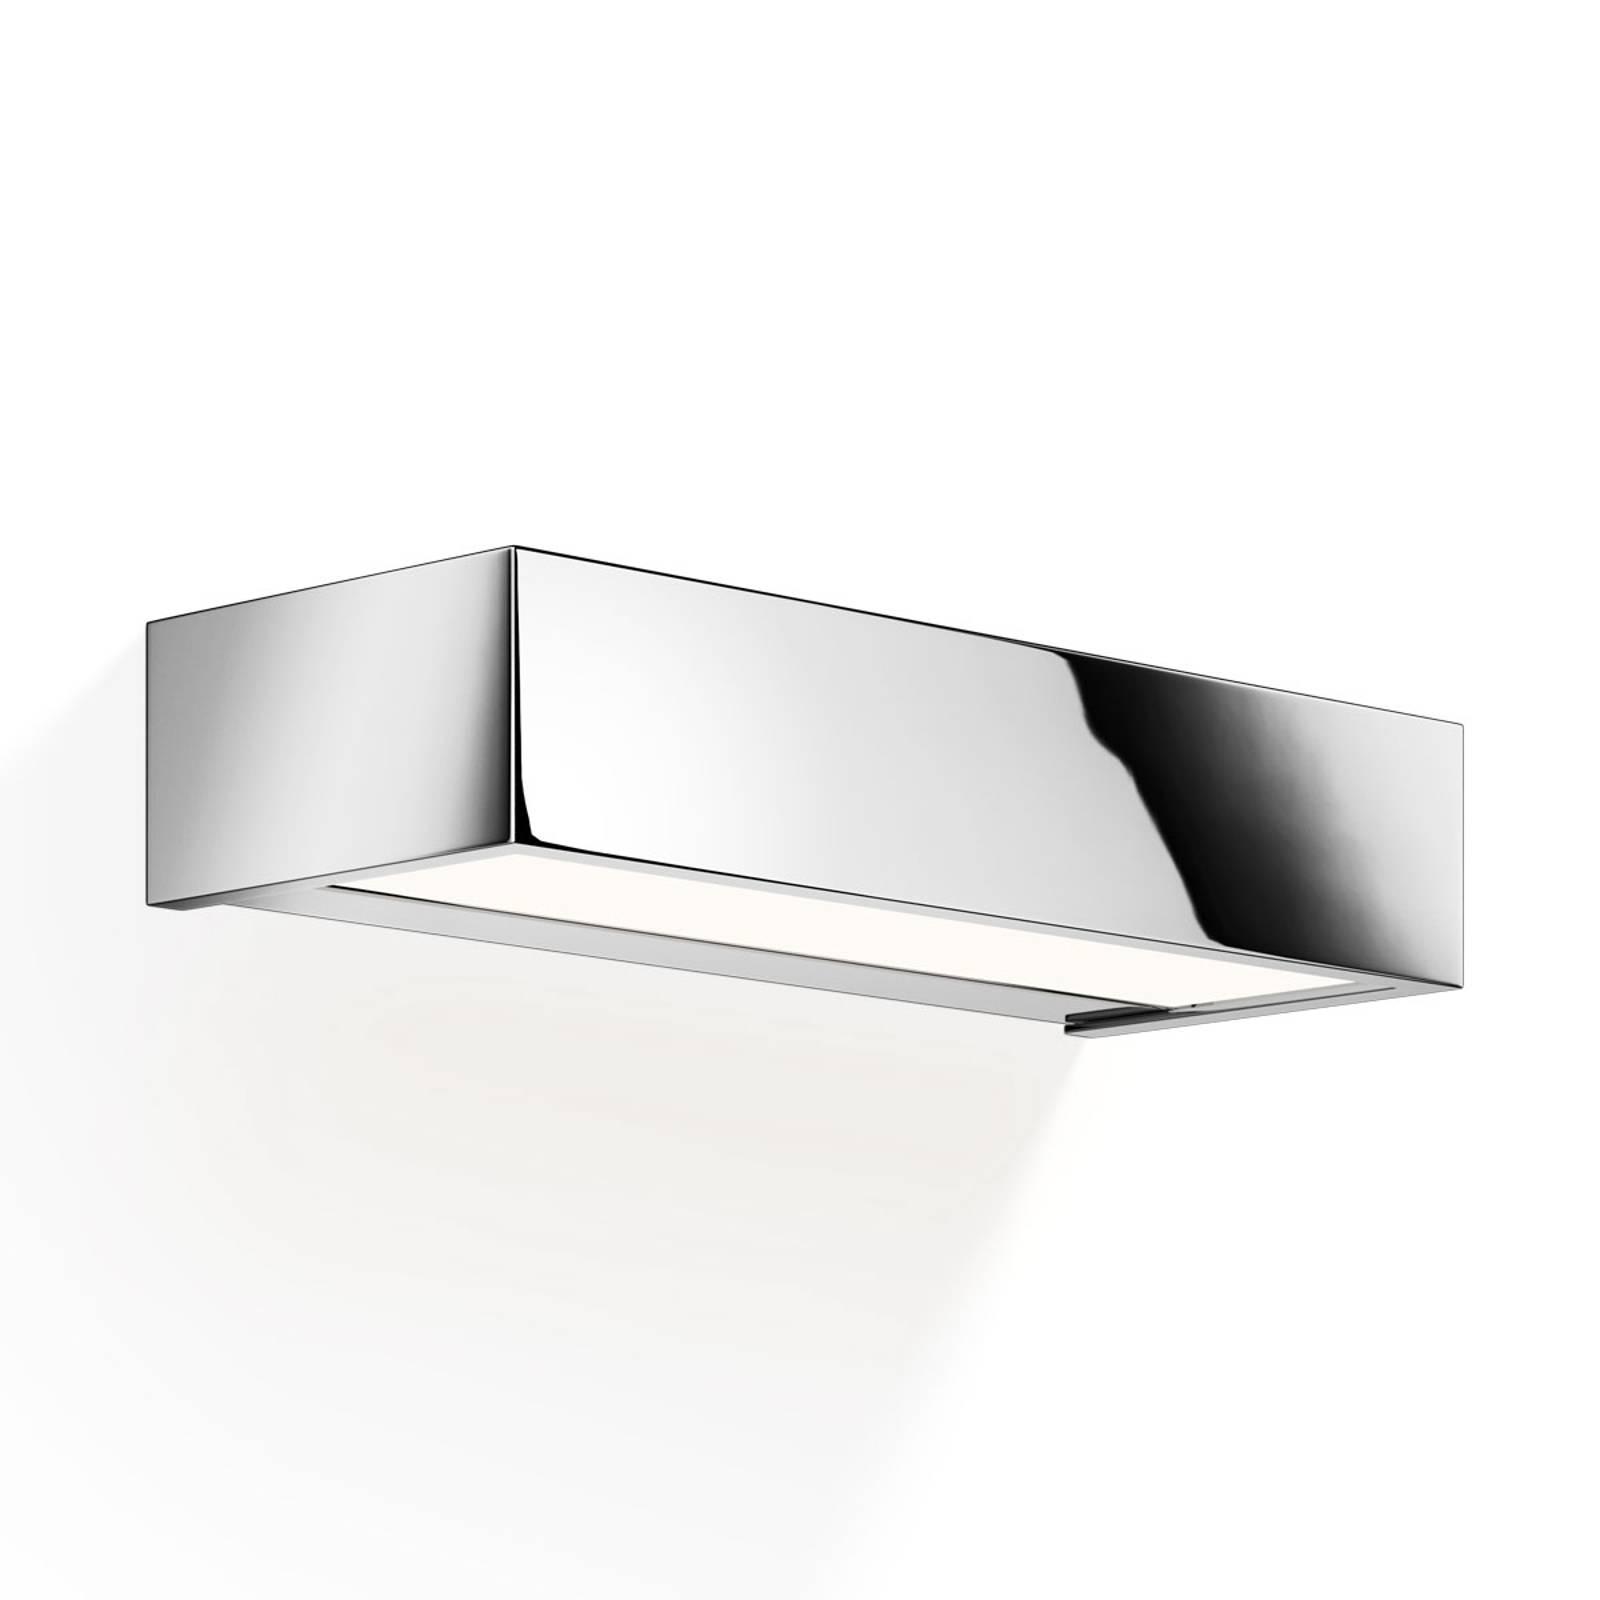 Decor Walther Box 25 N LED wandlamp 3.000 K